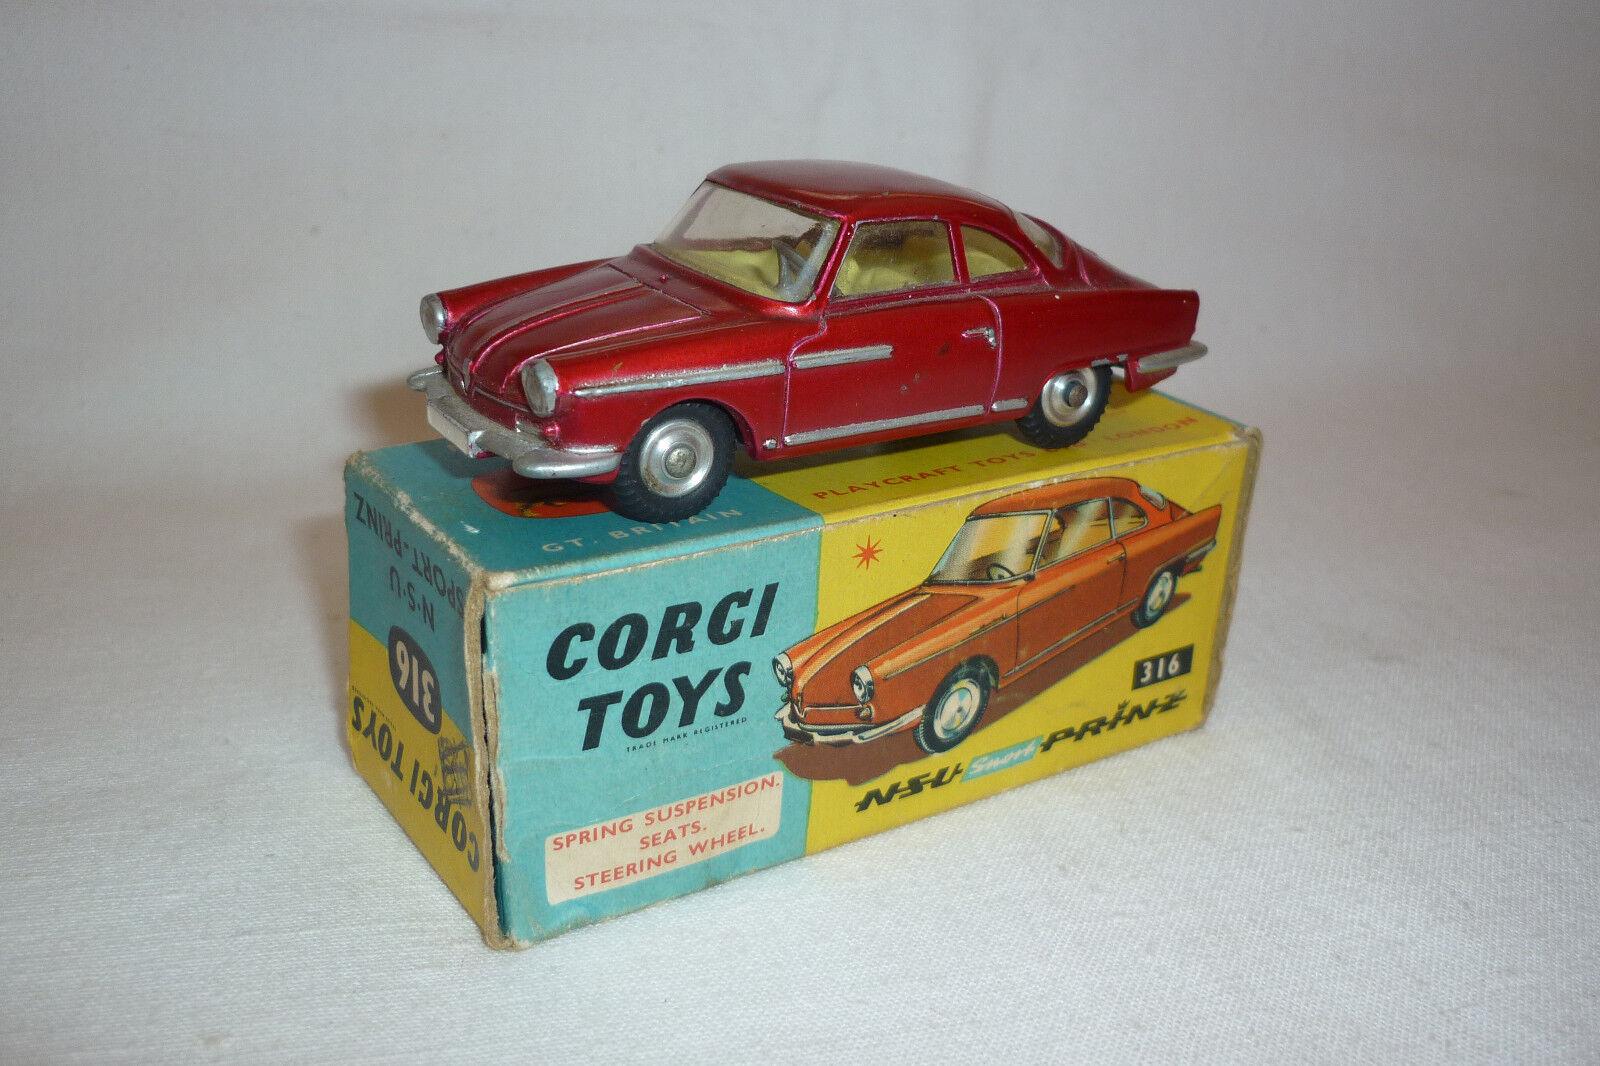 Corgi Toys - Vintage Metal Model - 316 - NSU - Sport Prince - (Corgi 14)